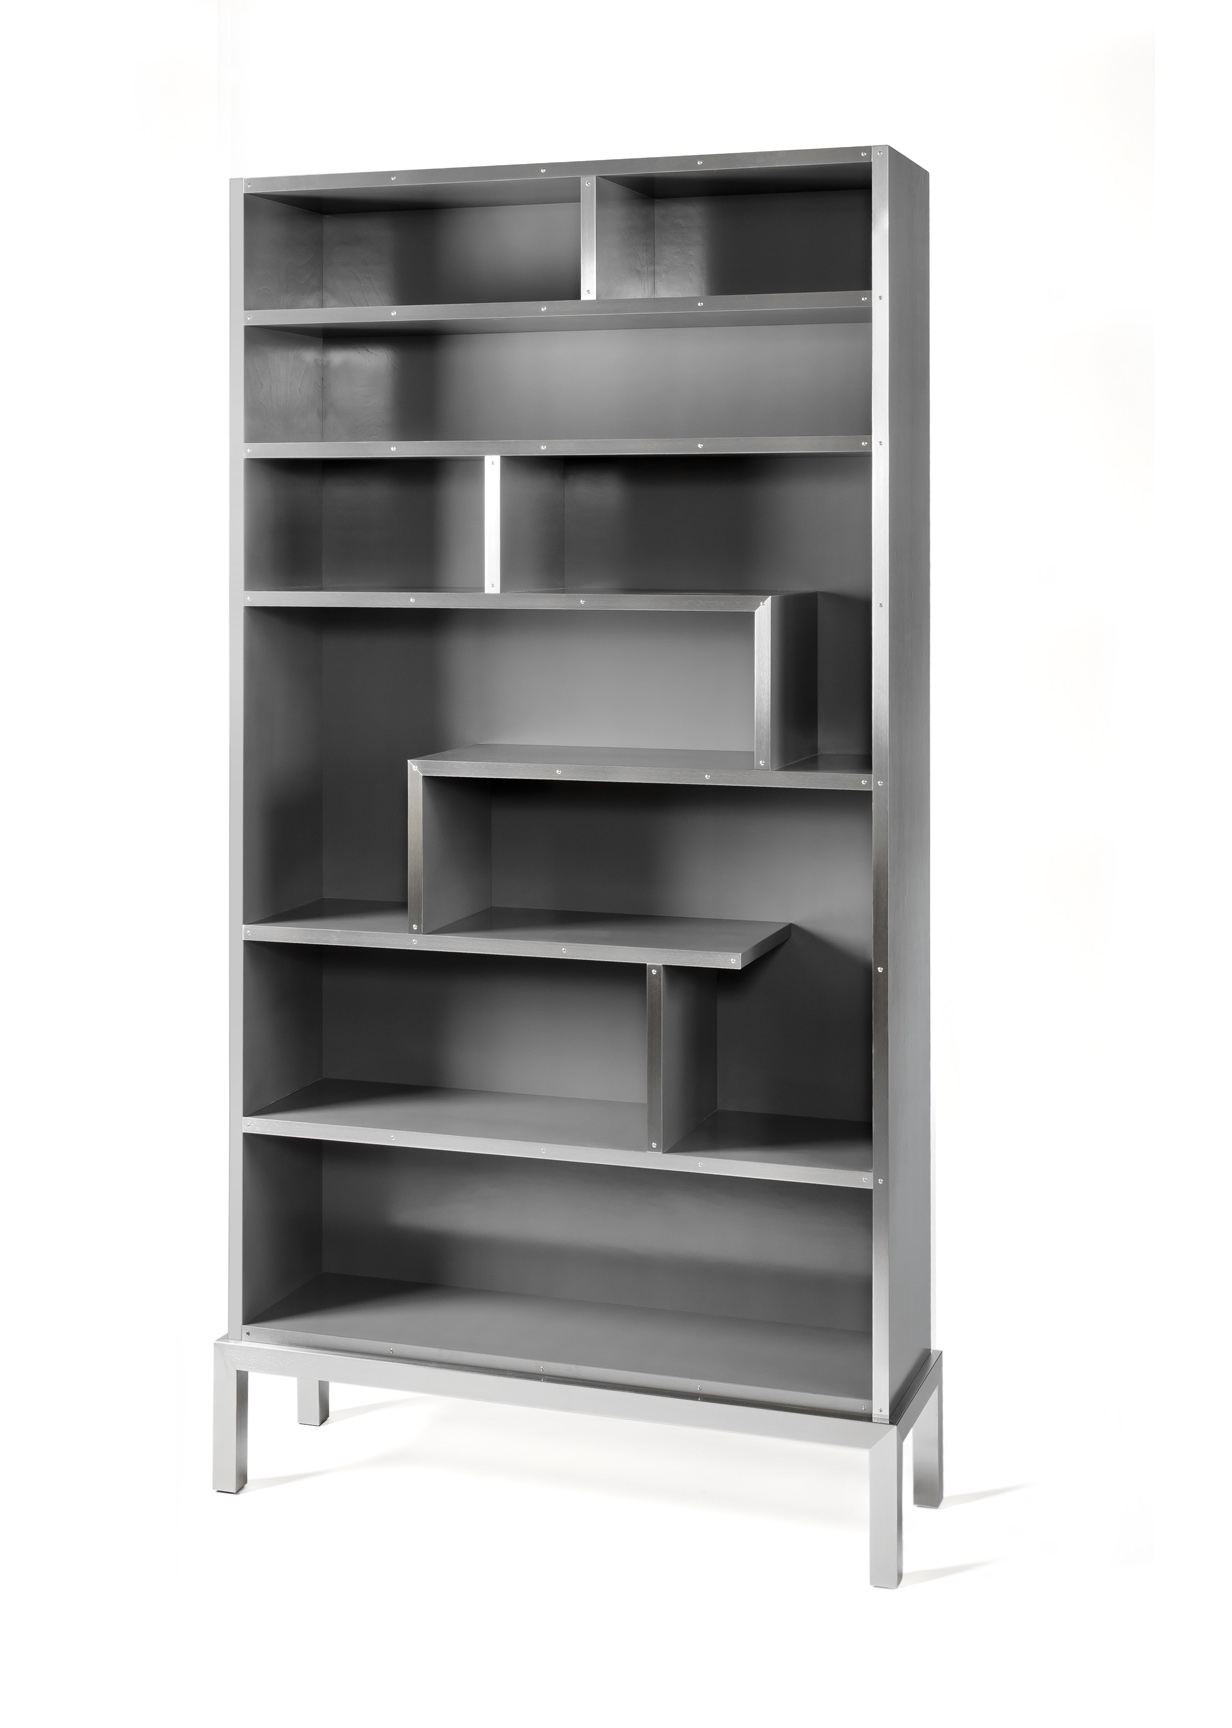 Bookshelf - gray with brushed stainless fascia.jpg